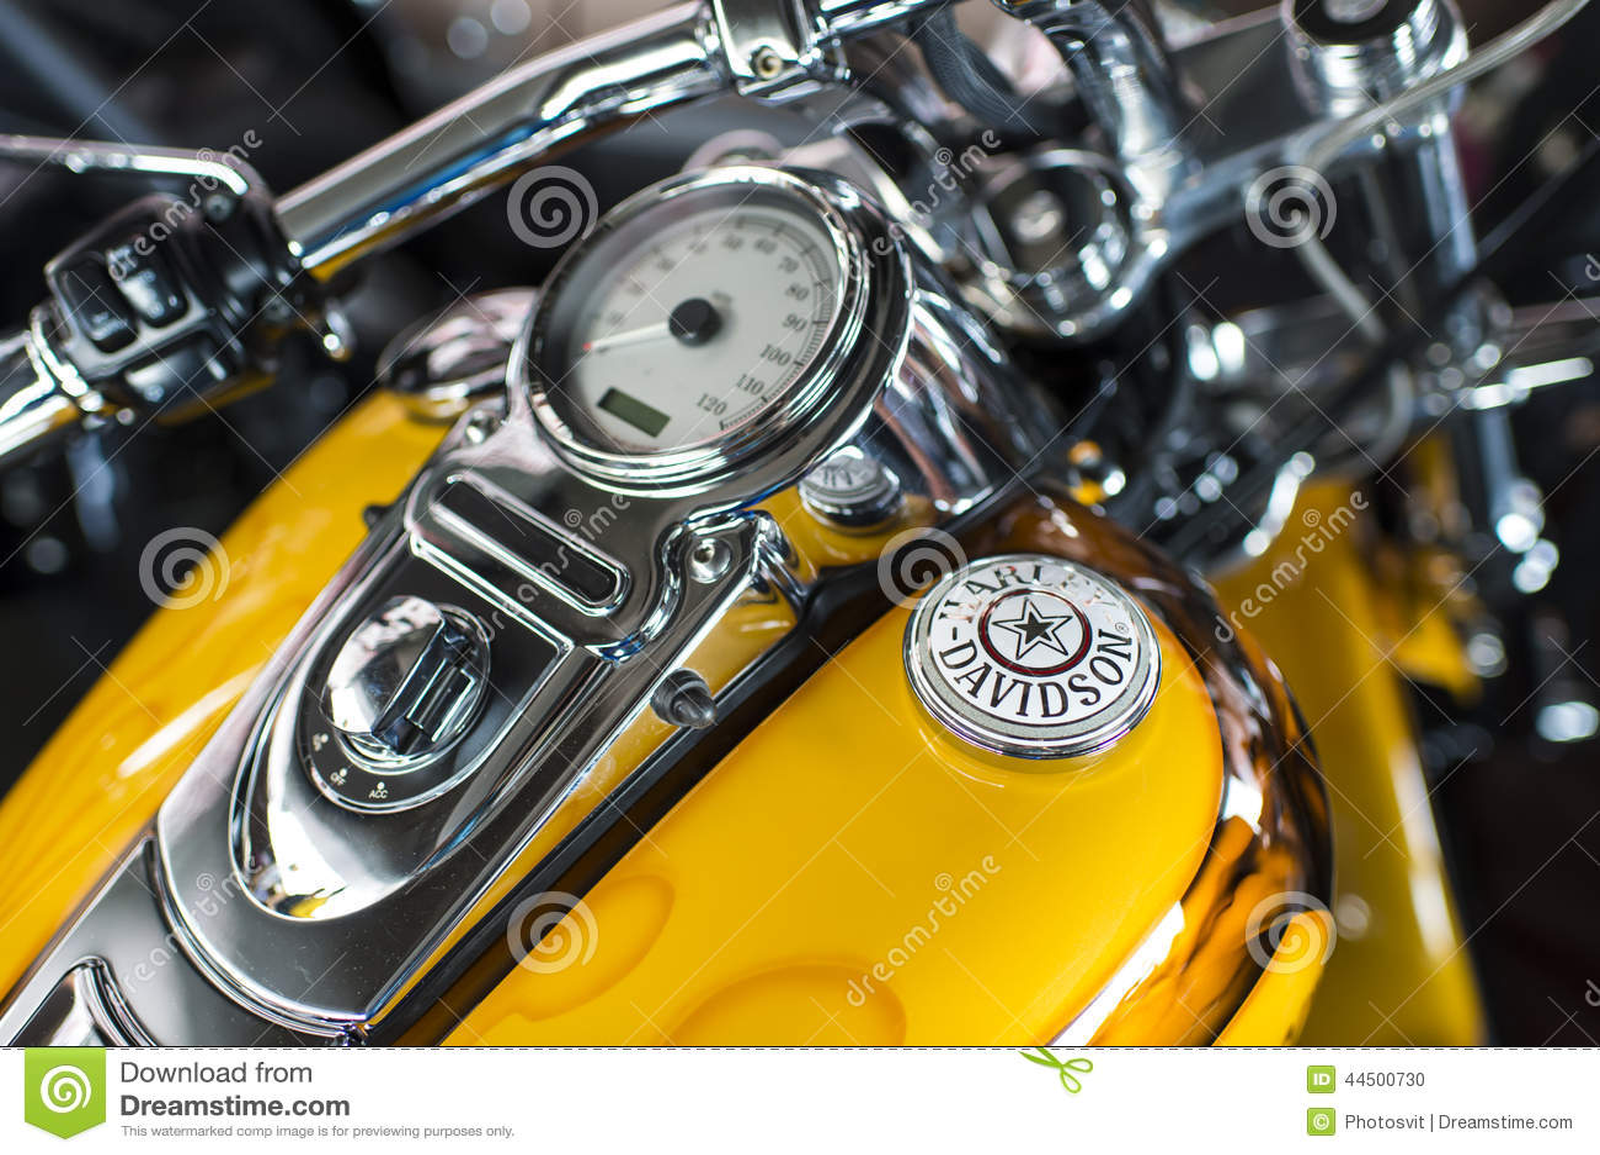 Harley Davidson motorcycle dashboard and speedometer detail